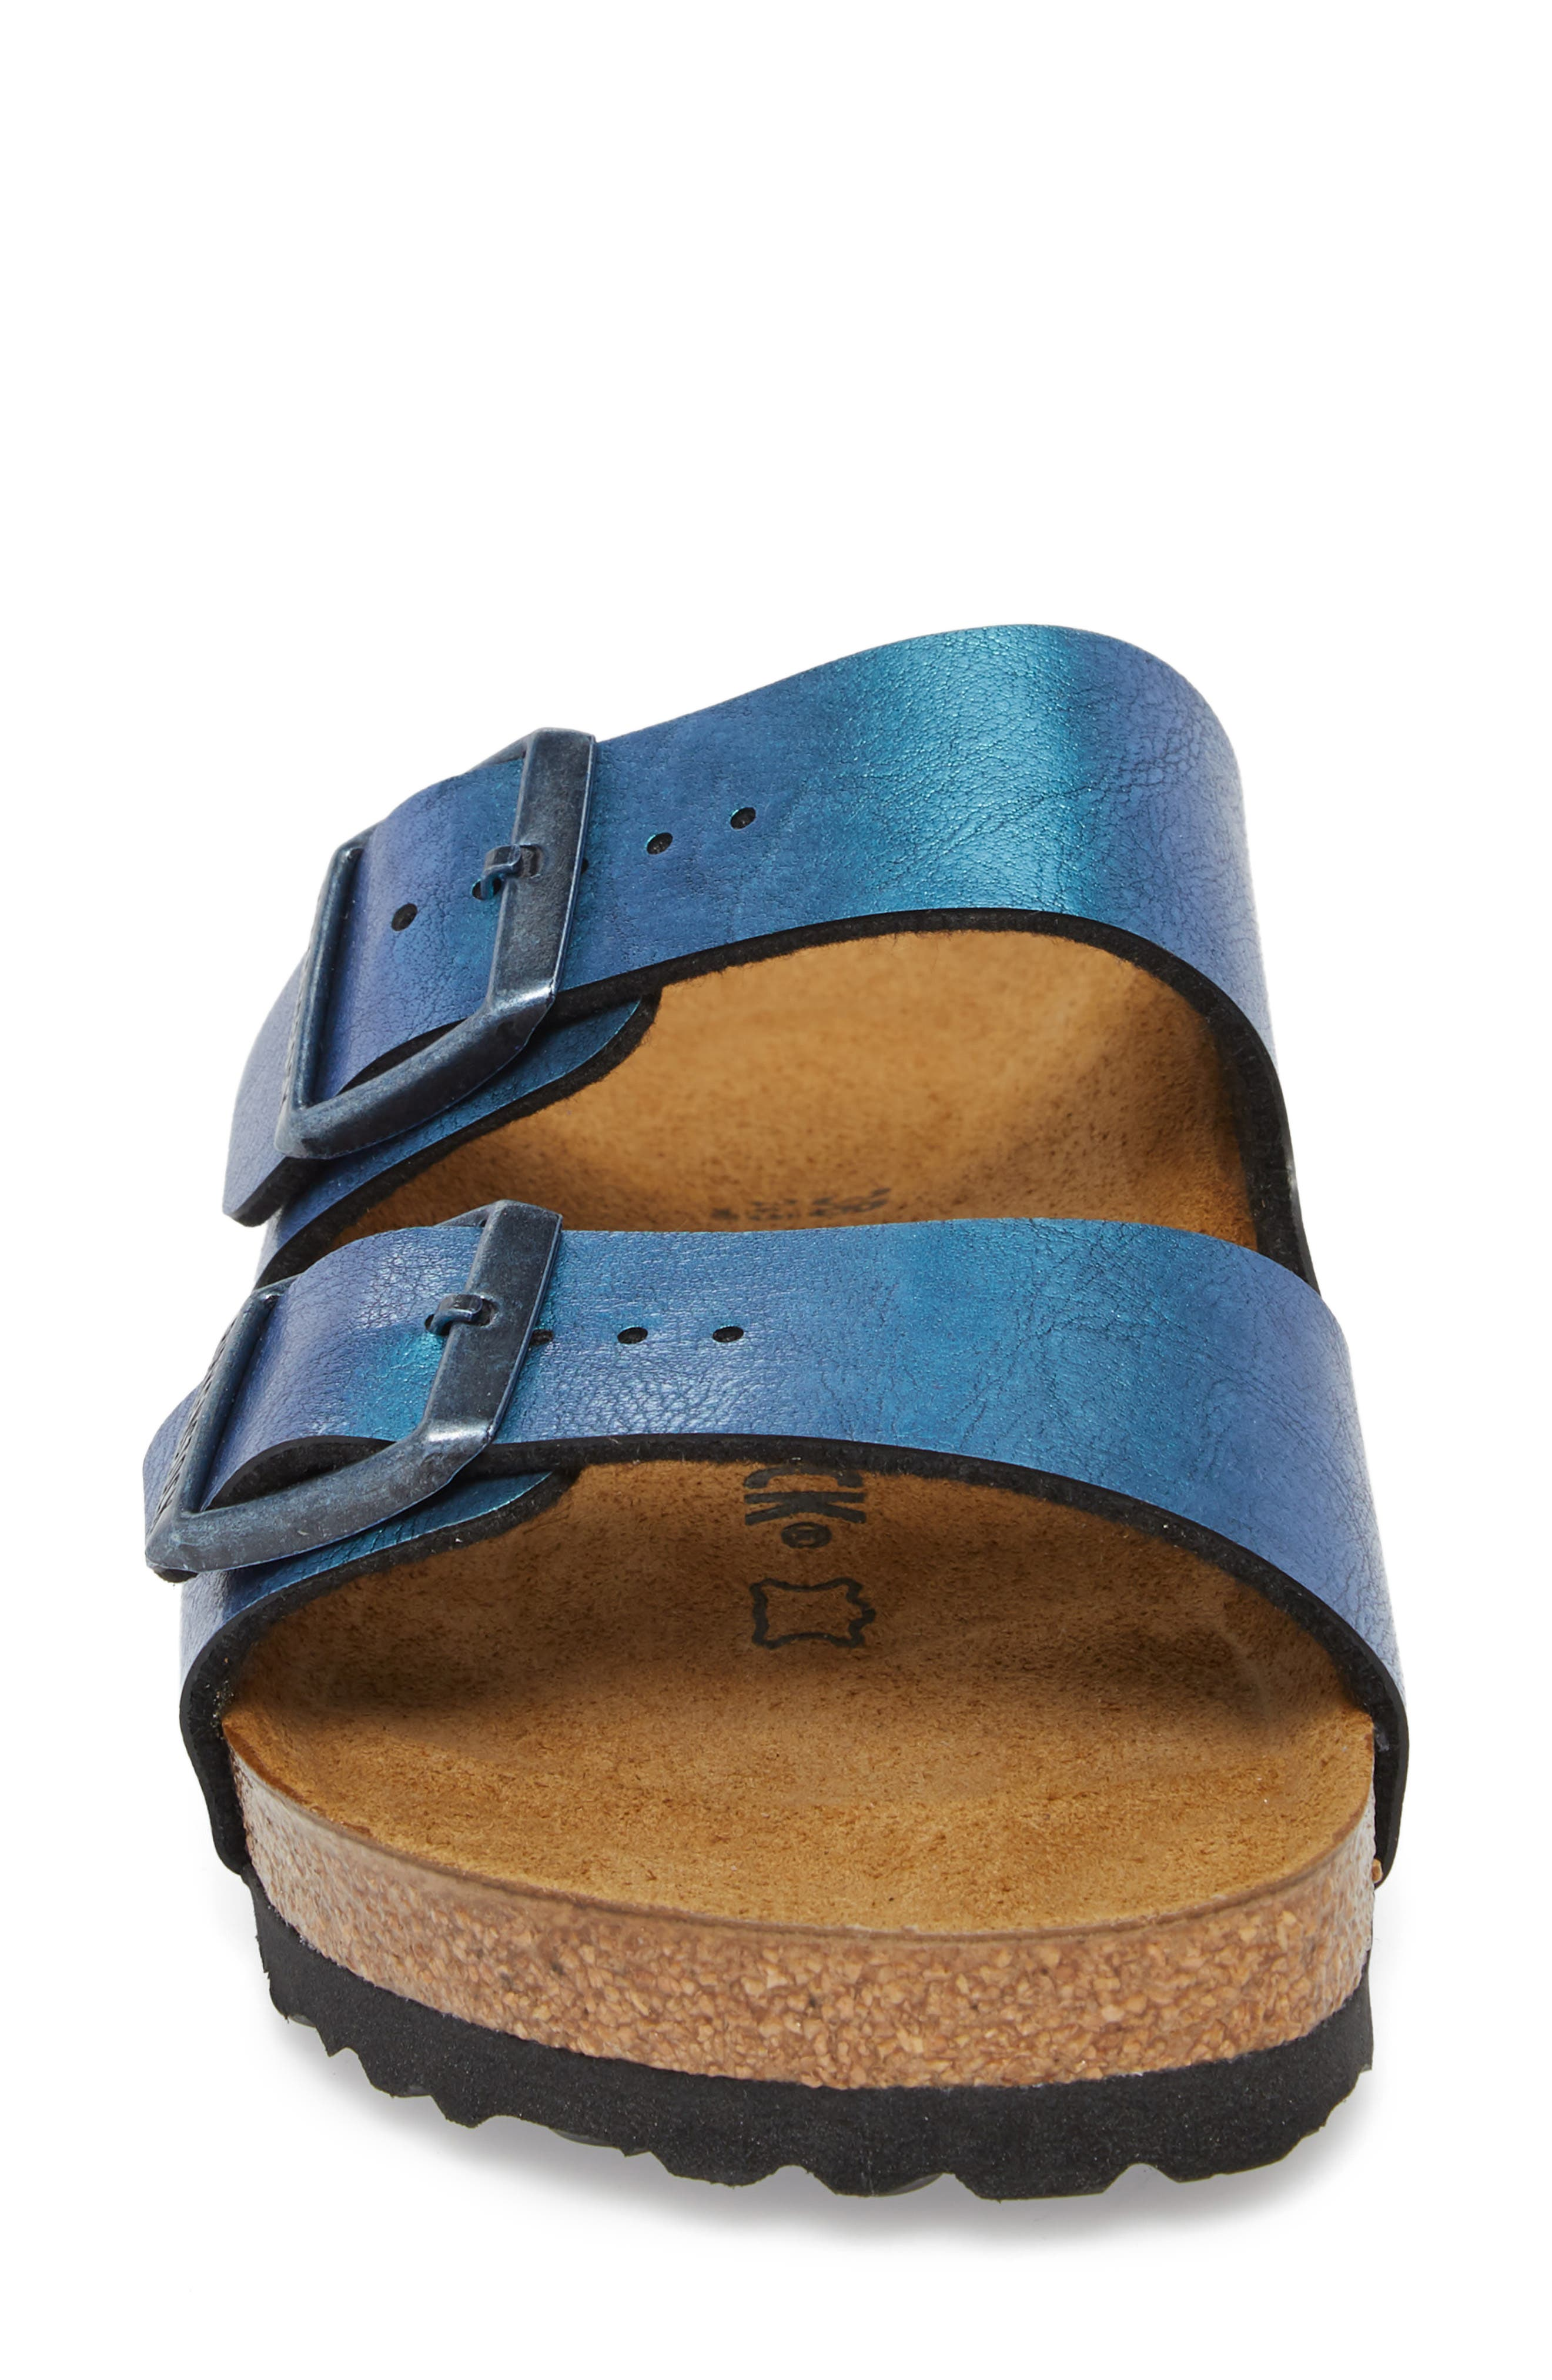 Arizona Graceful Birko-Flor<sup>™</sup> Sandal,                             Alternate thumbnail 4, color,                             400